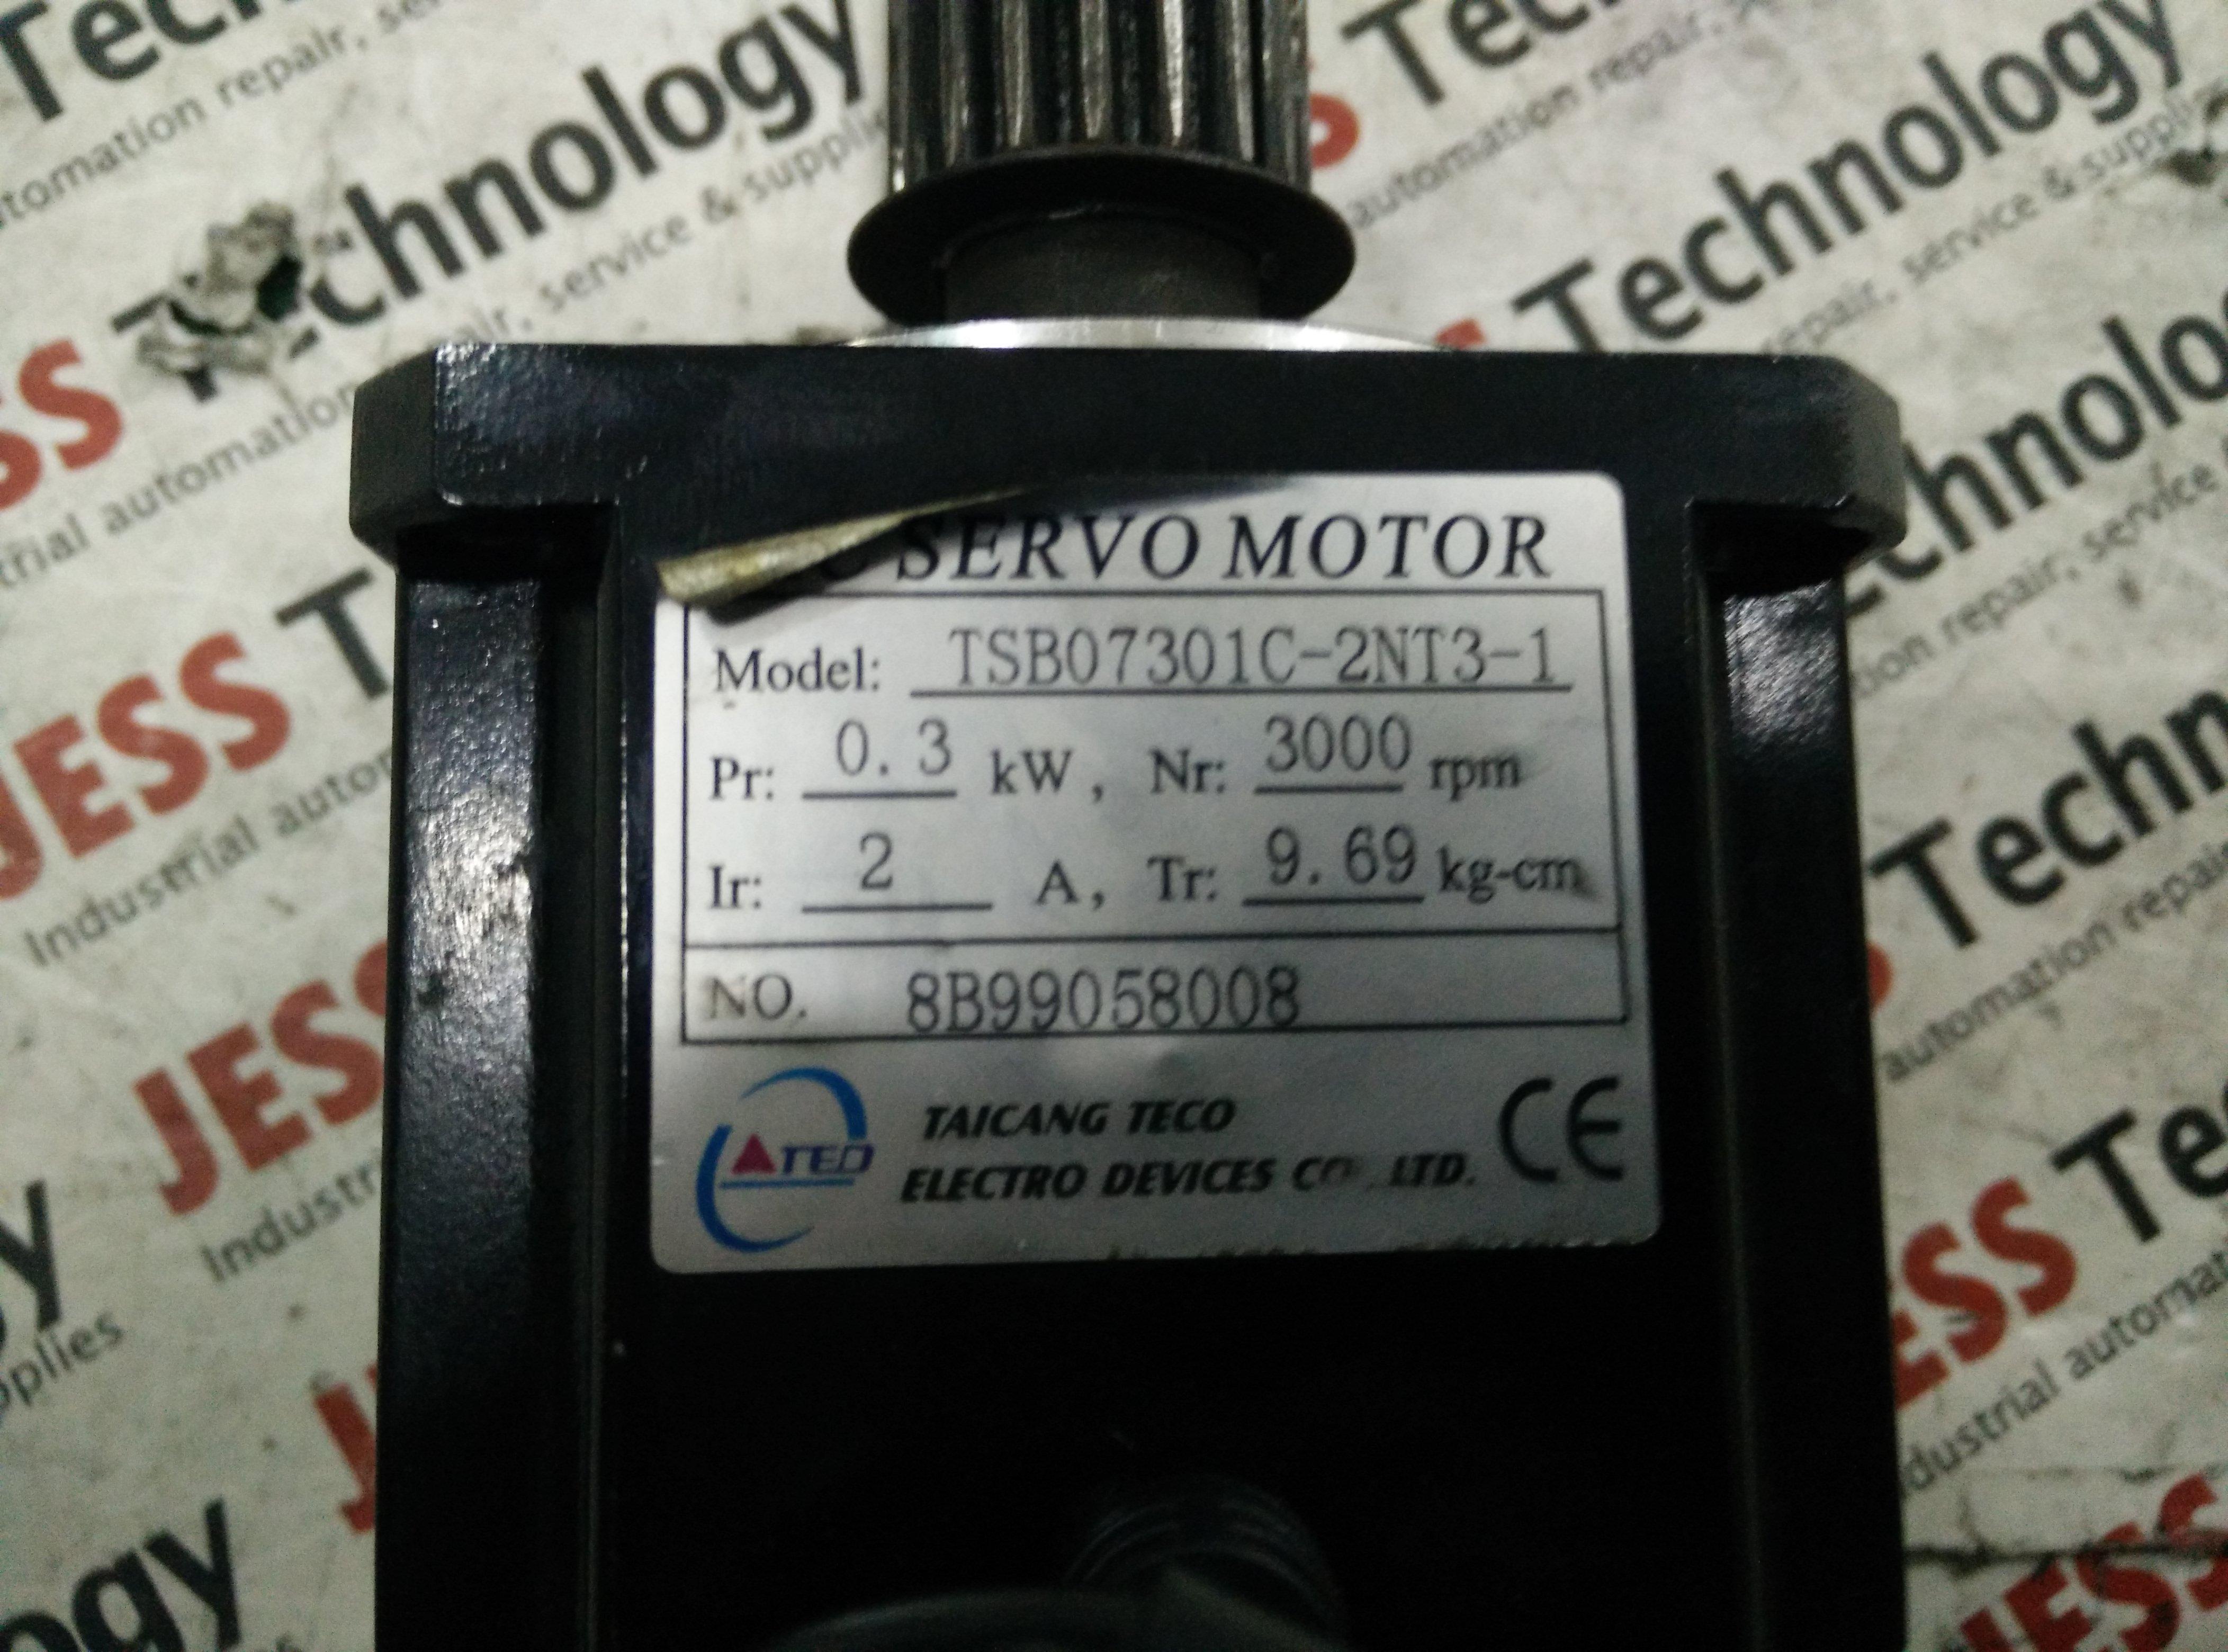 Repair TSB07301C-2NT3-1 ACOPOS AC SERVO MOTOR in Malaysia, Singapore, Thailand, Indonesia